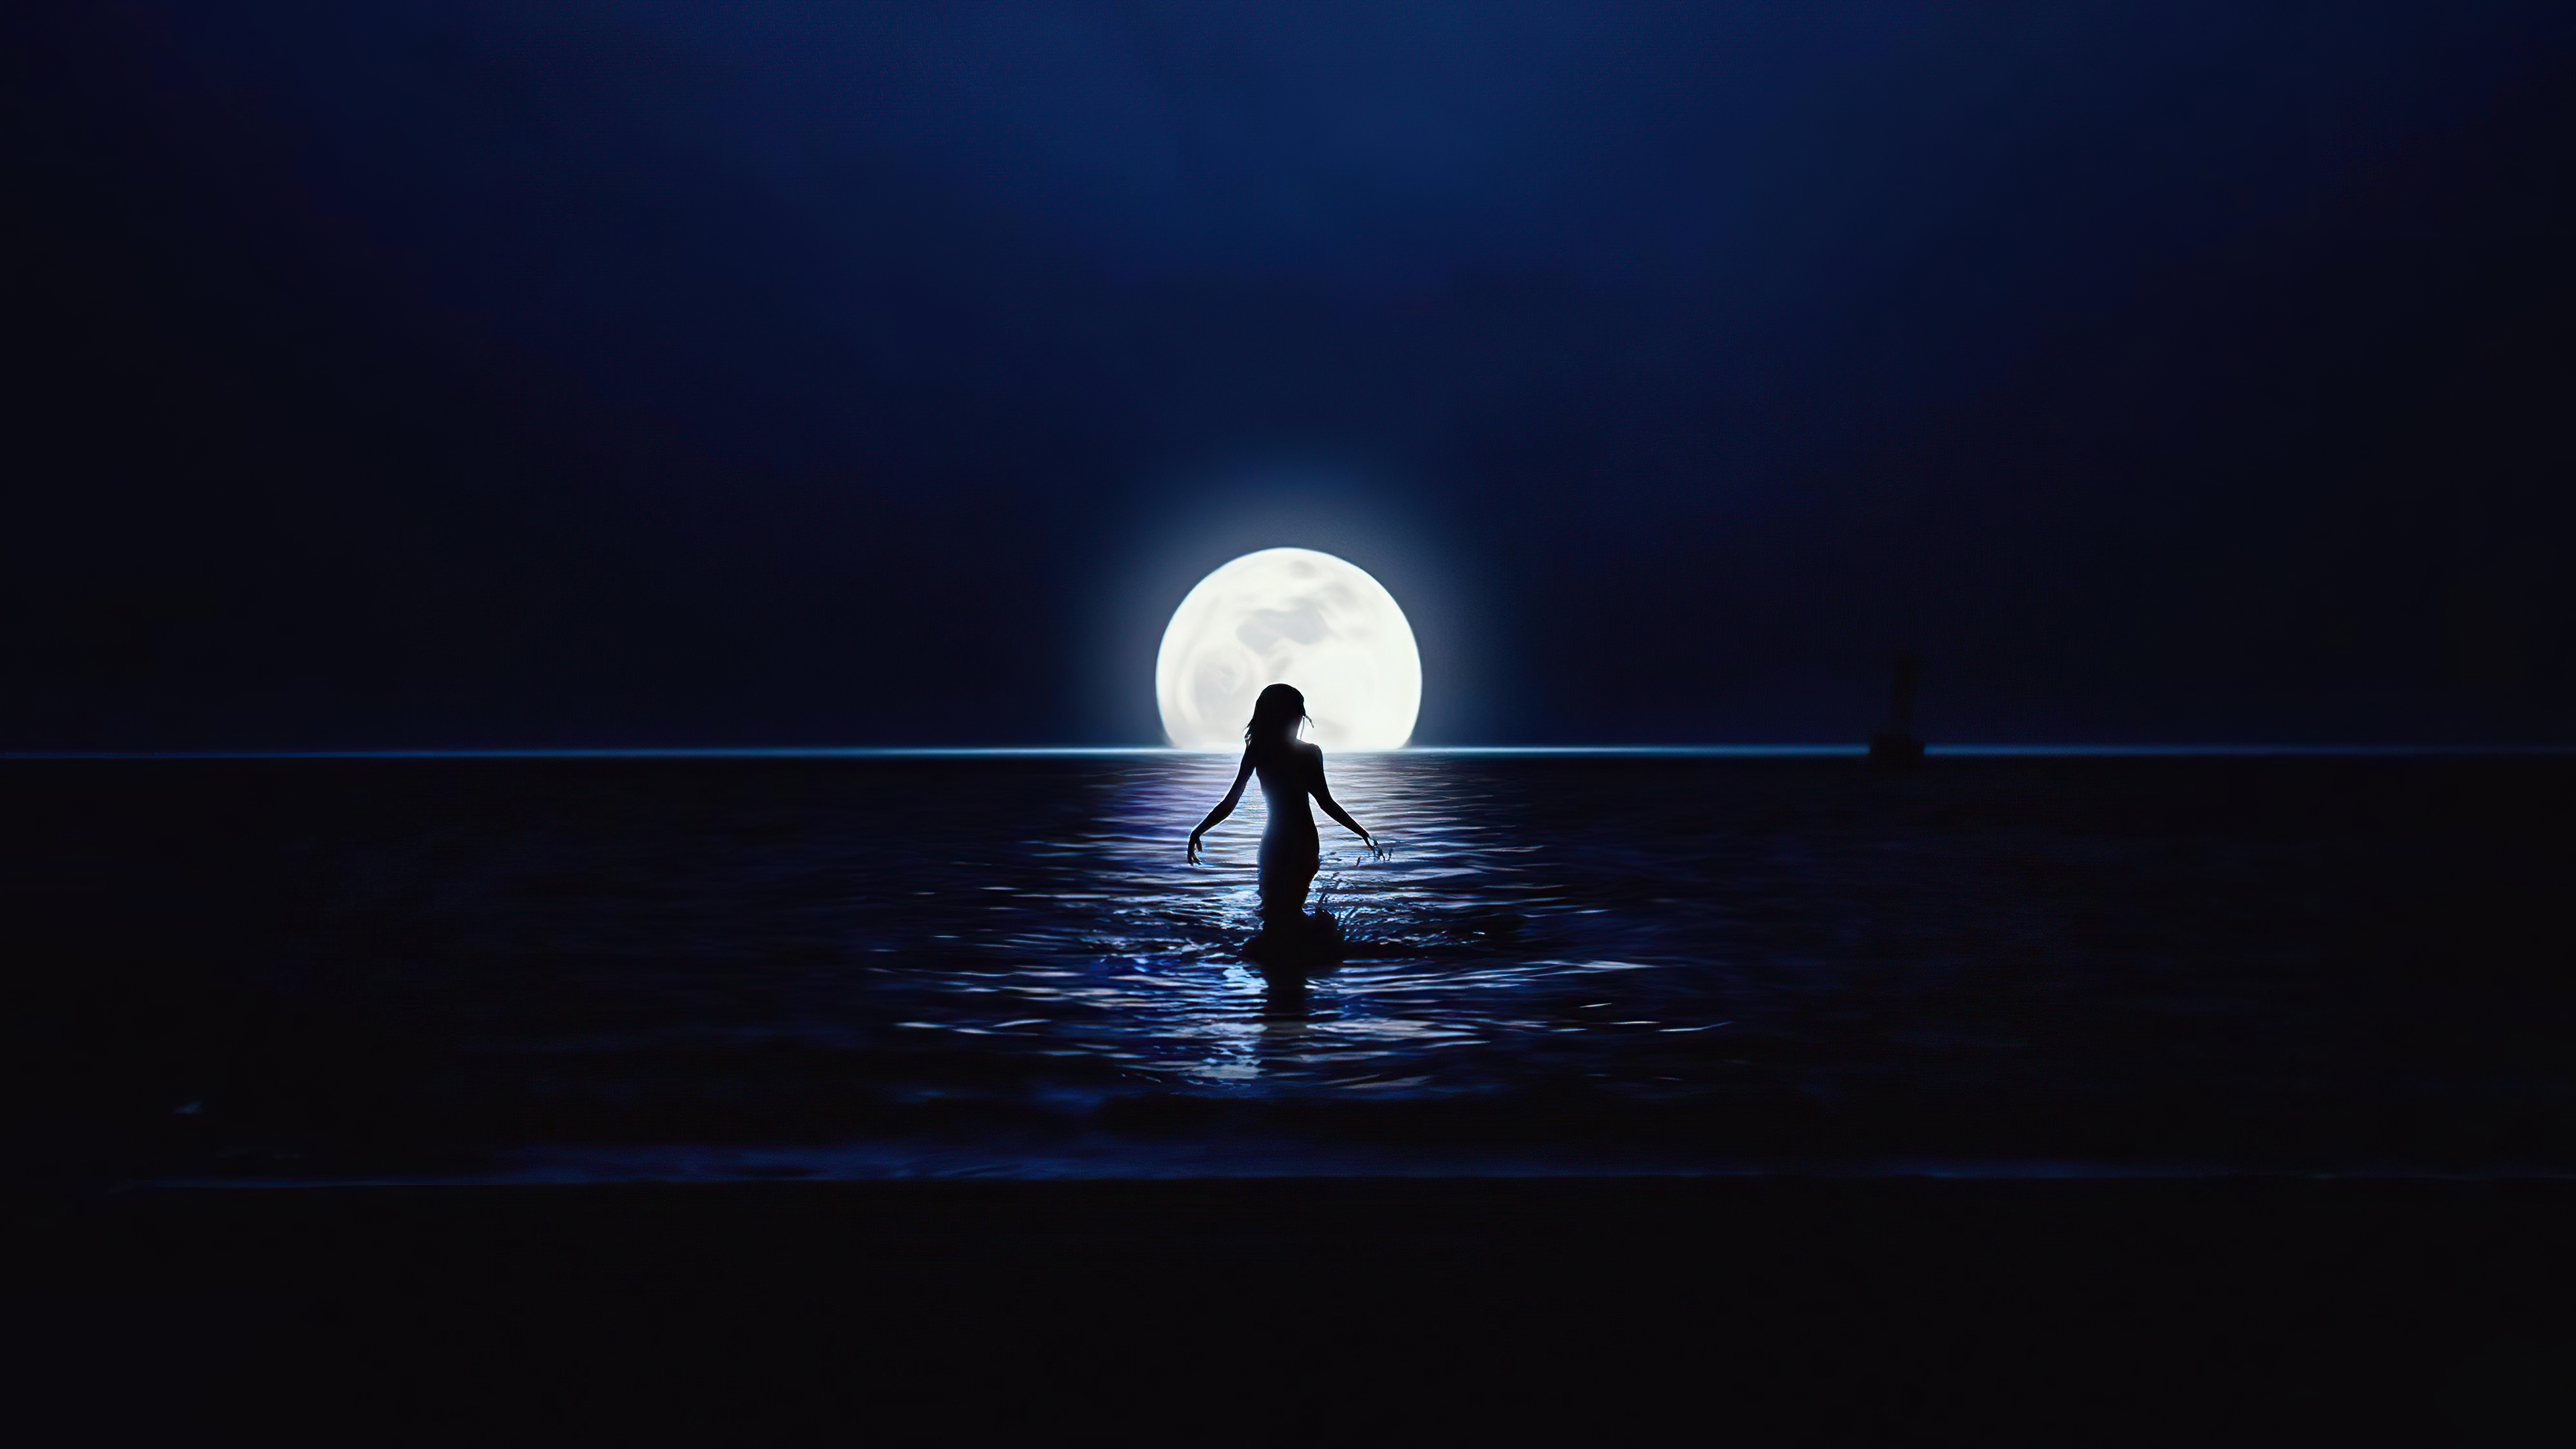 girl walking towards moon in ocean 4k 1634170484 - Girl Walking Towards Moon In Ocean 4k - Girl Walking Towards Moon In Ocean wallpapers, Girl Walking Towards Moon In Ocean 4k wallpapers